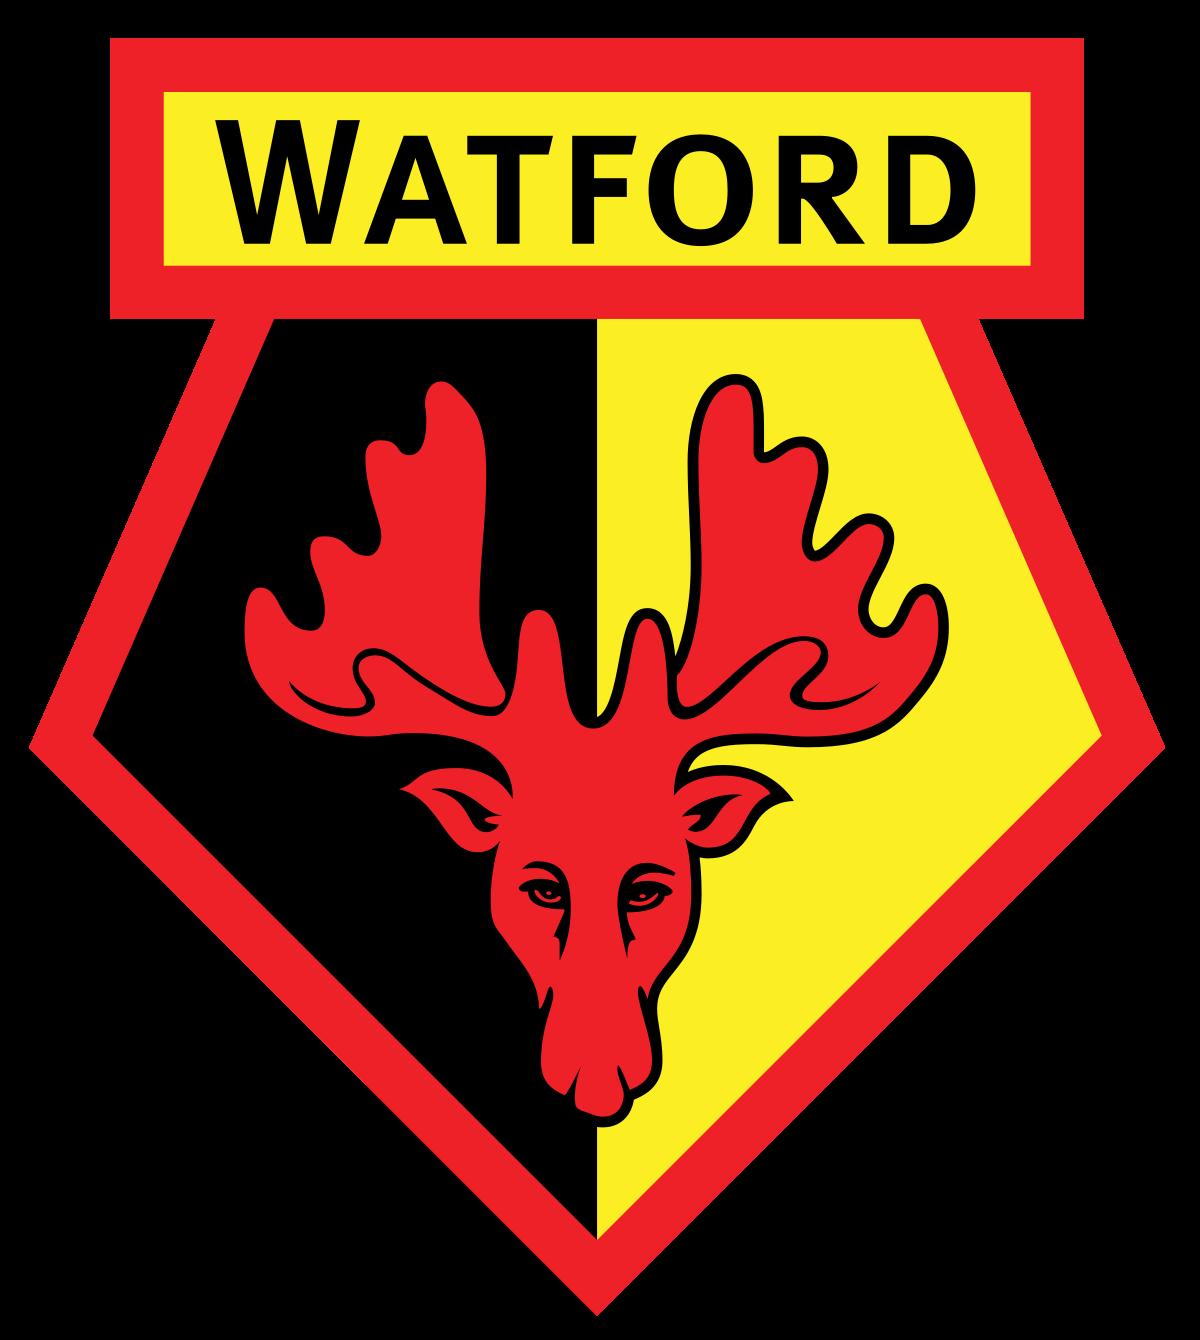 watford crest.png